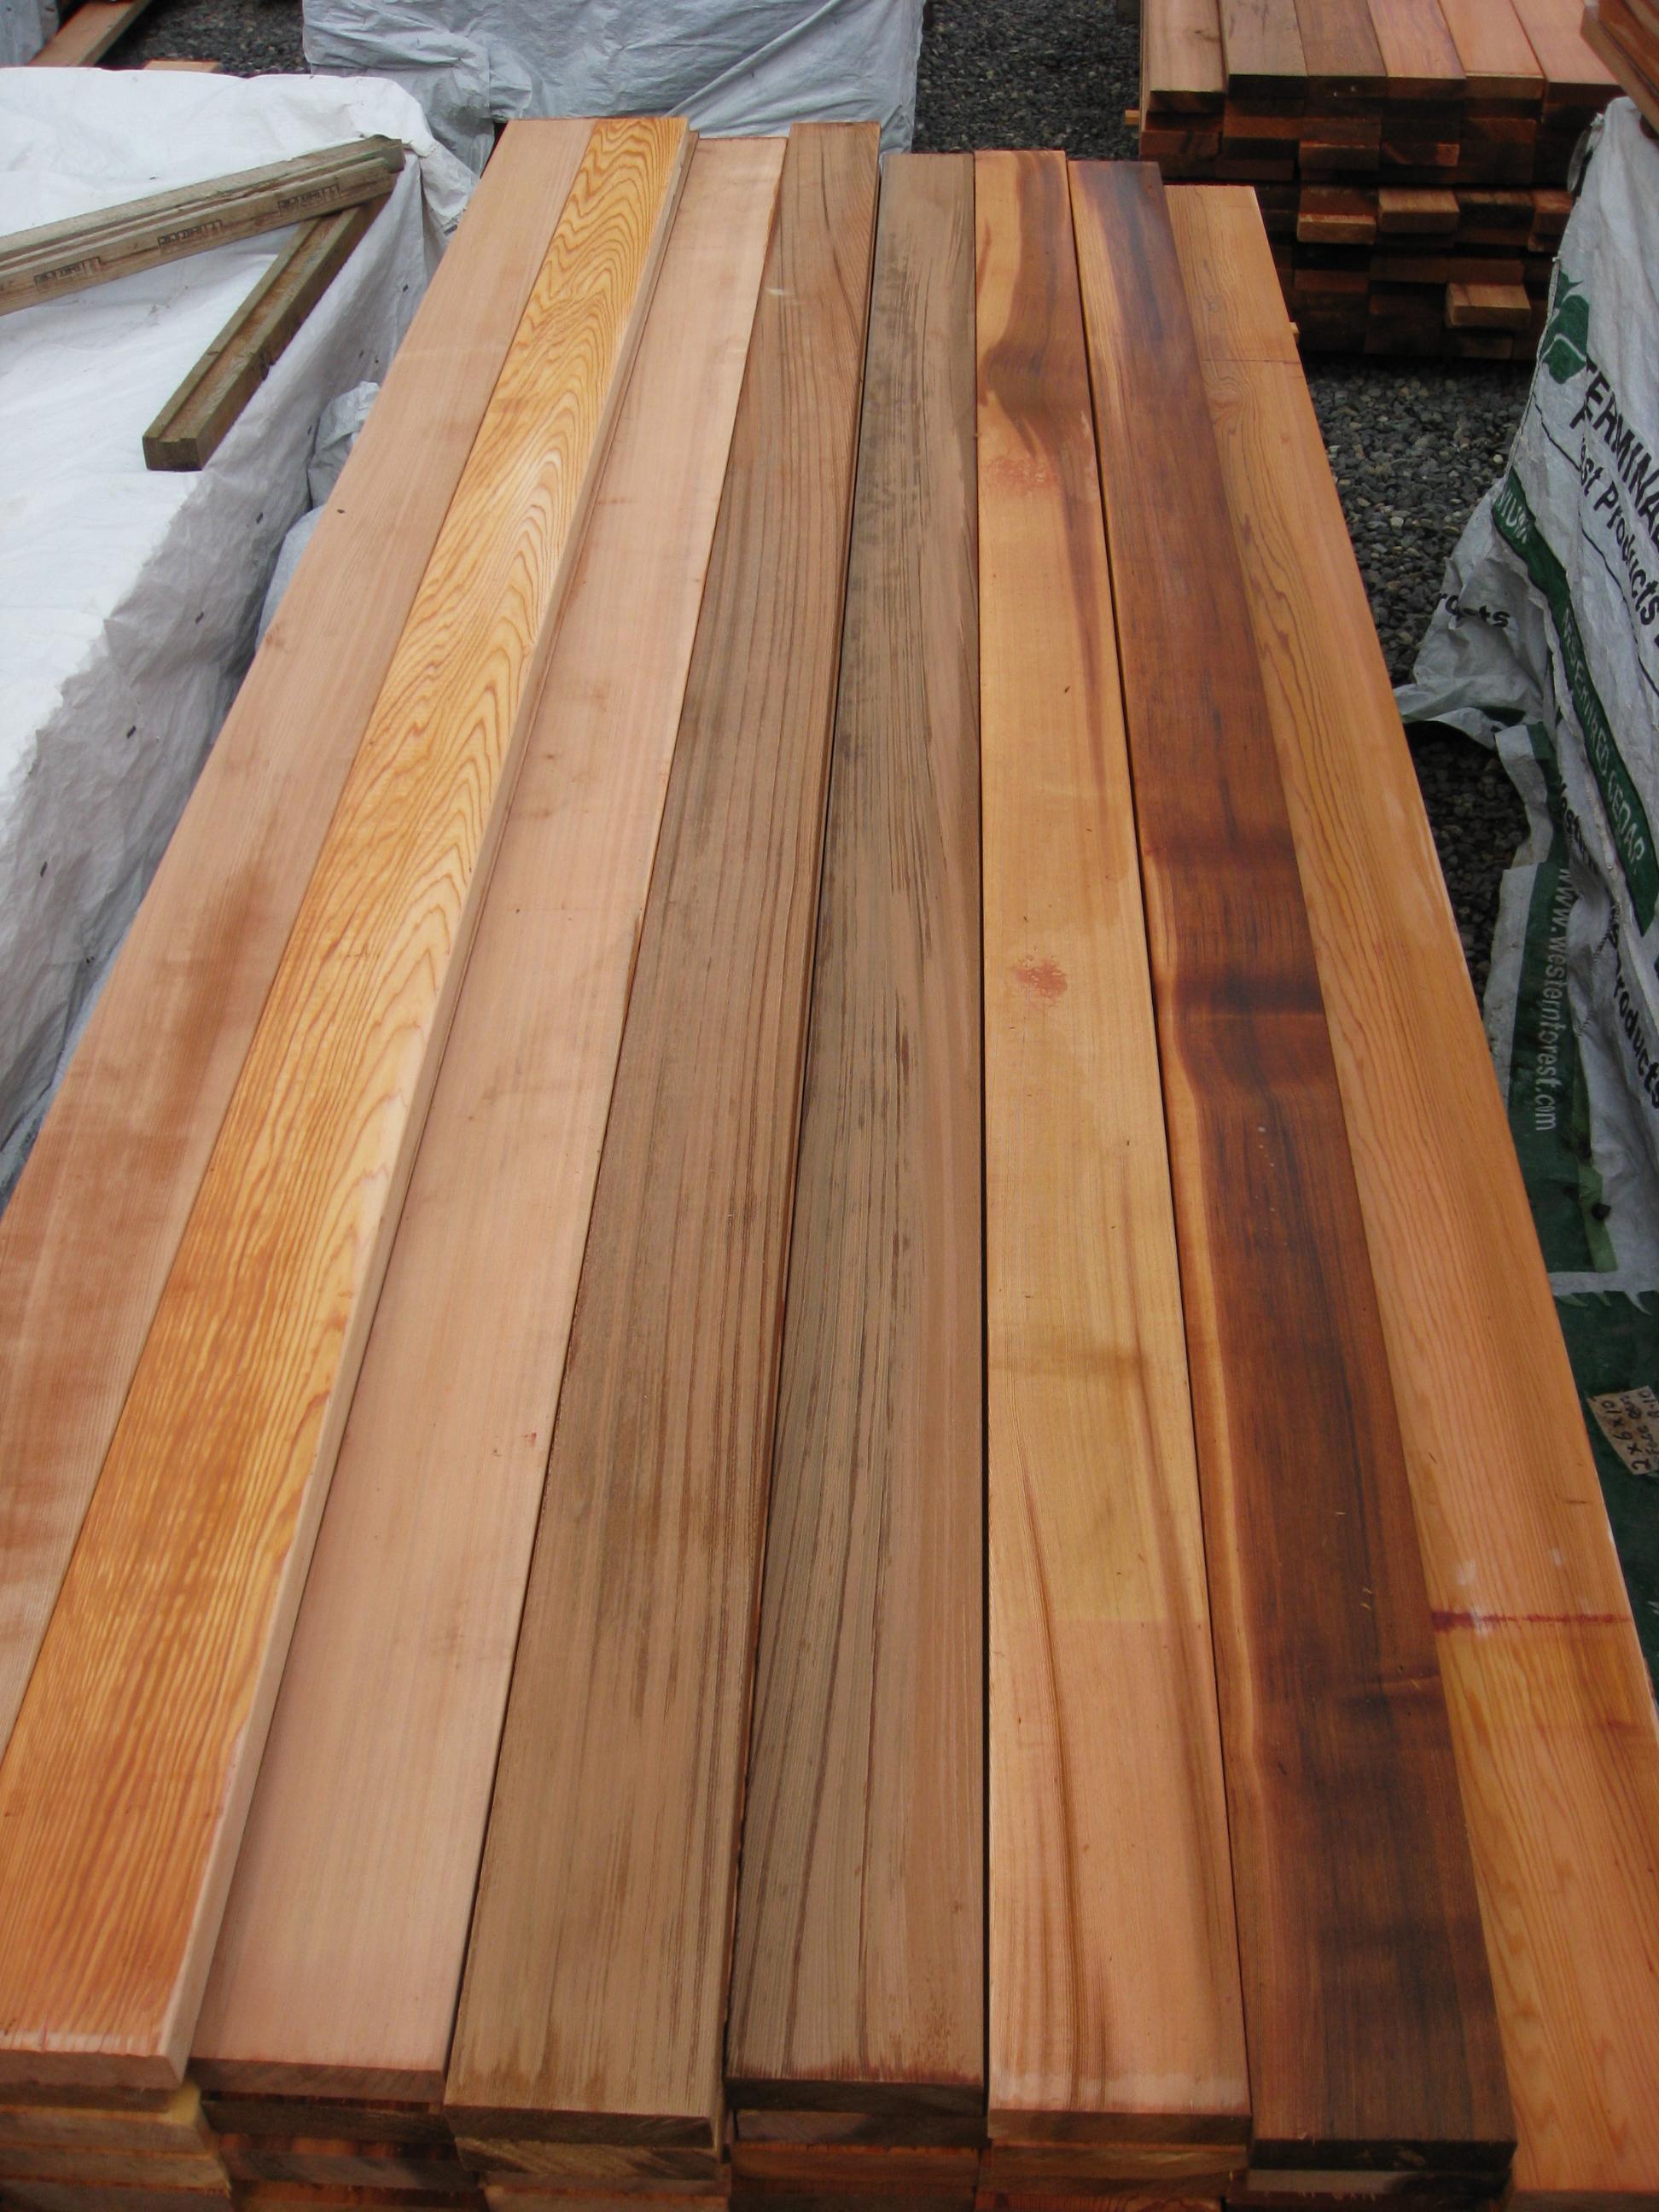 Custom Cedar Products Portland Or 97230 Angie S List